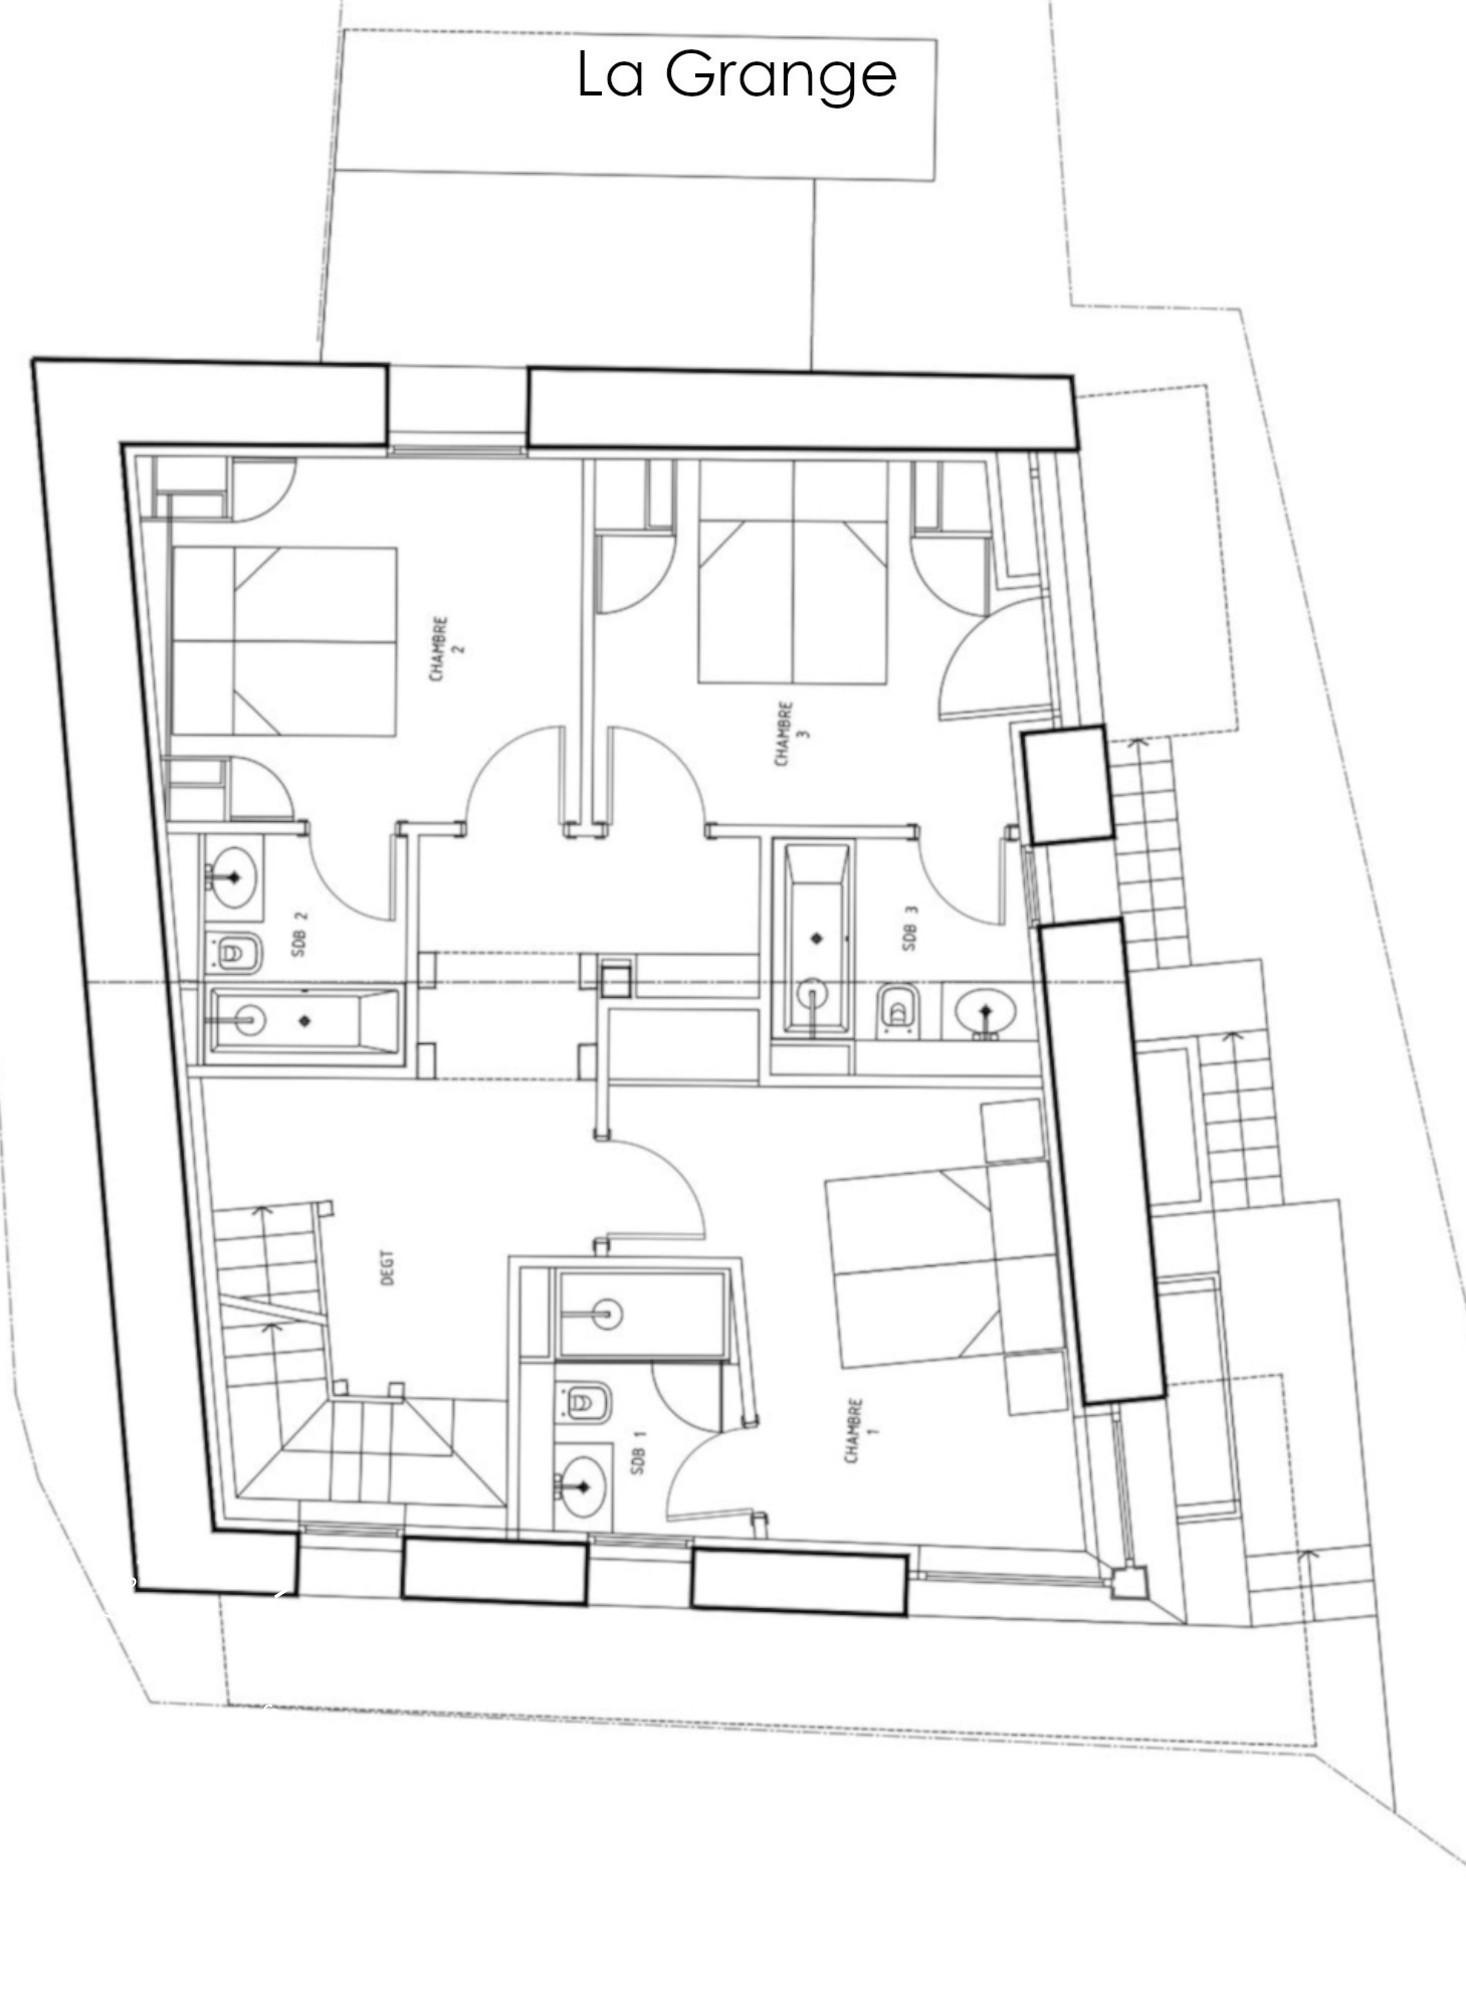 Chalet La Grange 1855 St-Martin-de-Belleville Floor Plan 2